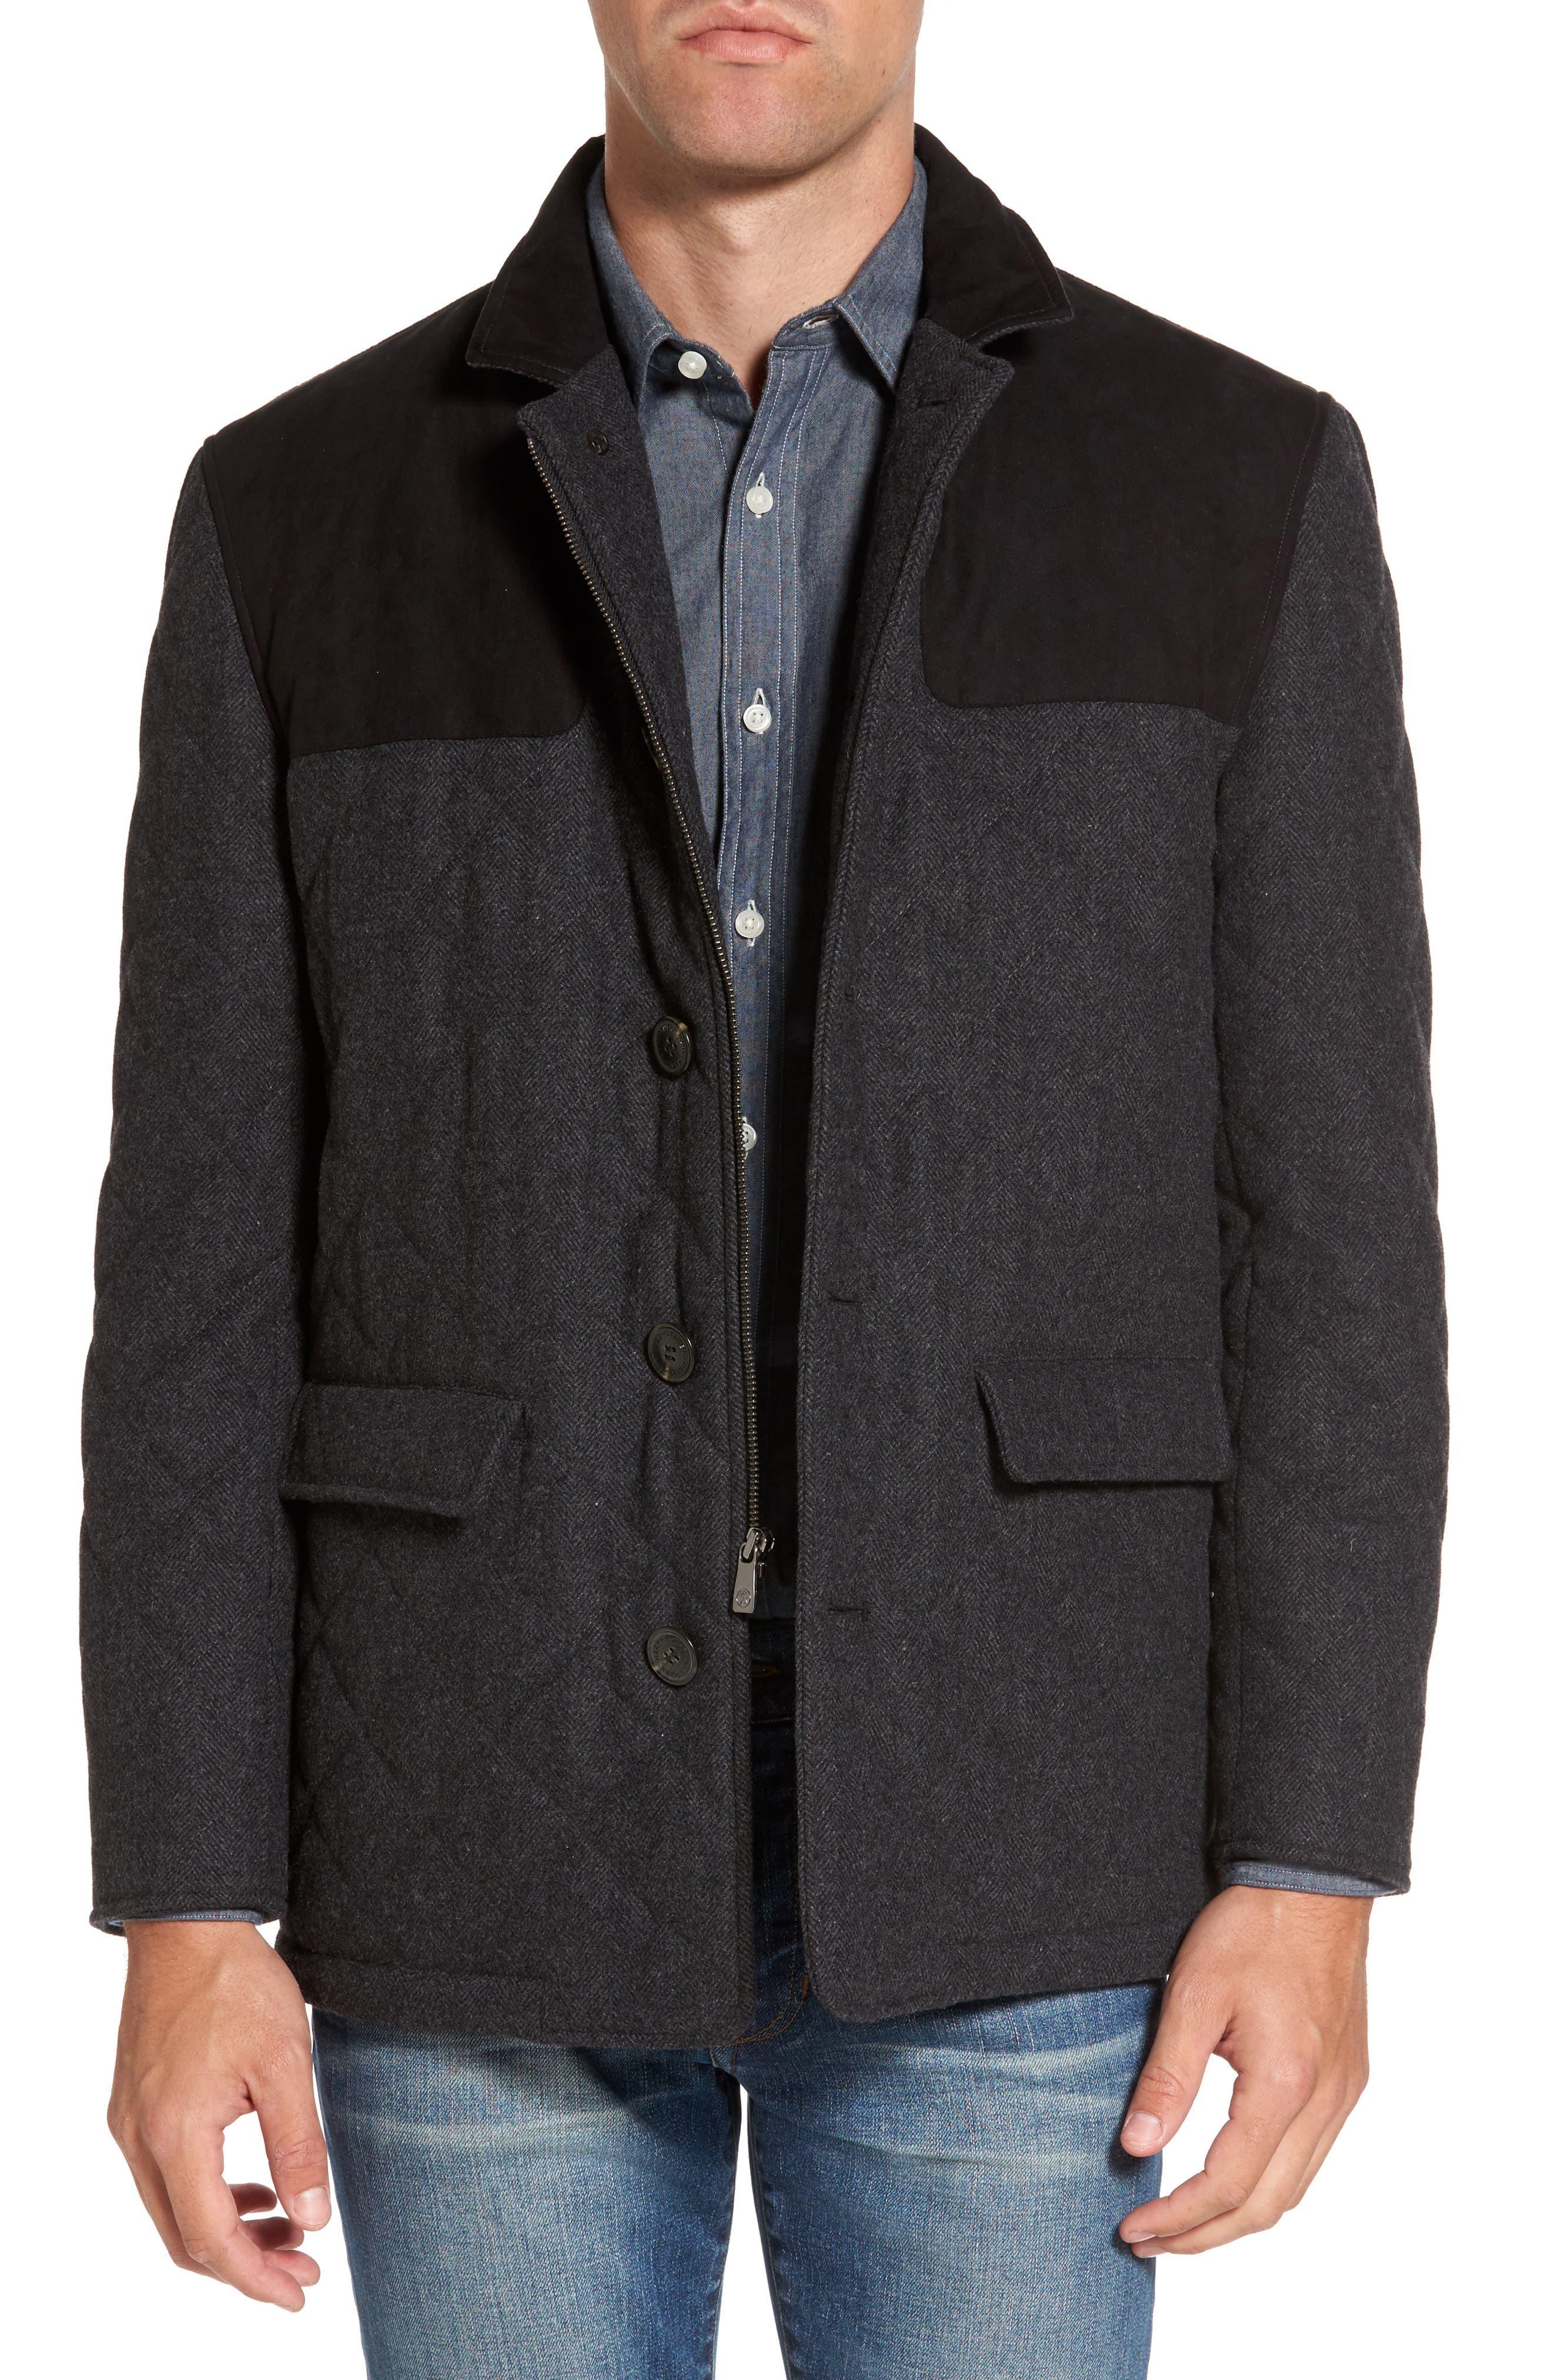 Hart Schaffner Marx 'Shooter' Wool Blend Quilted Jacket